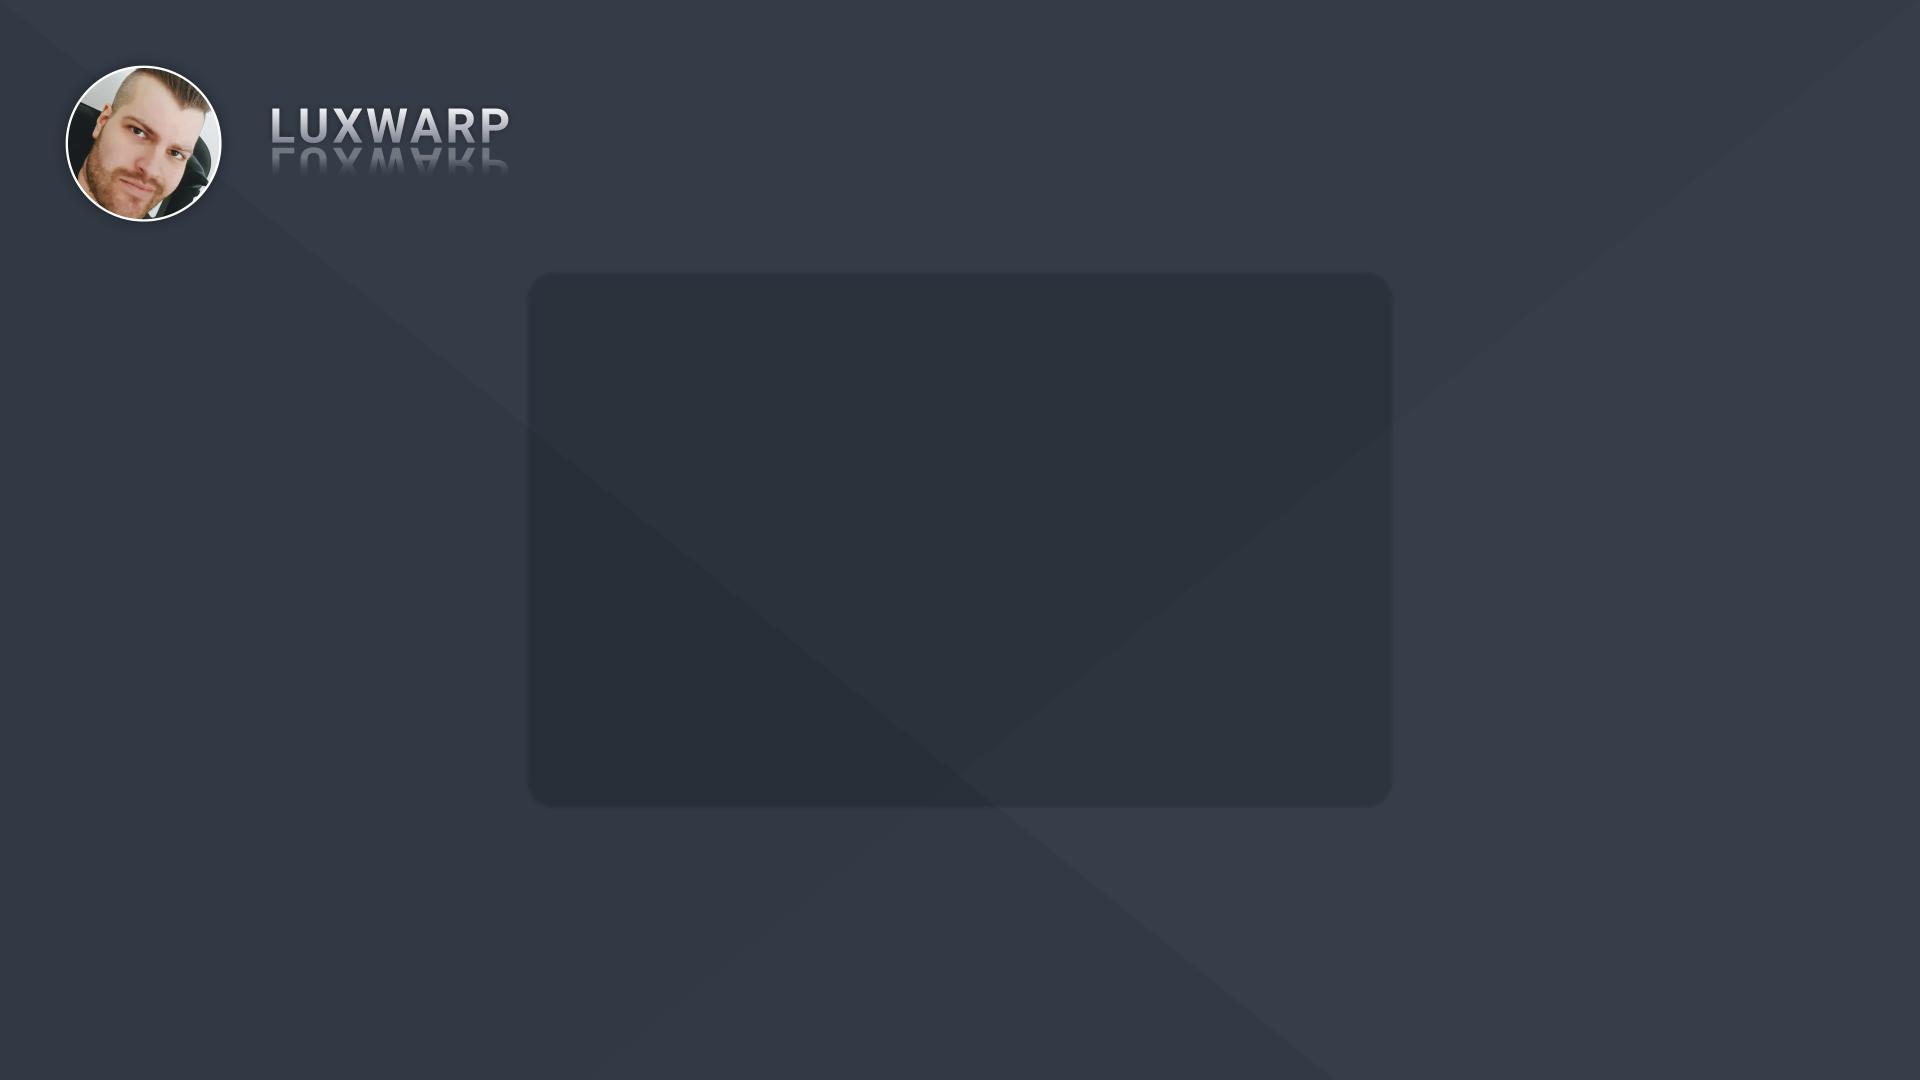 "Luxwarp wallpaper lock screen"""